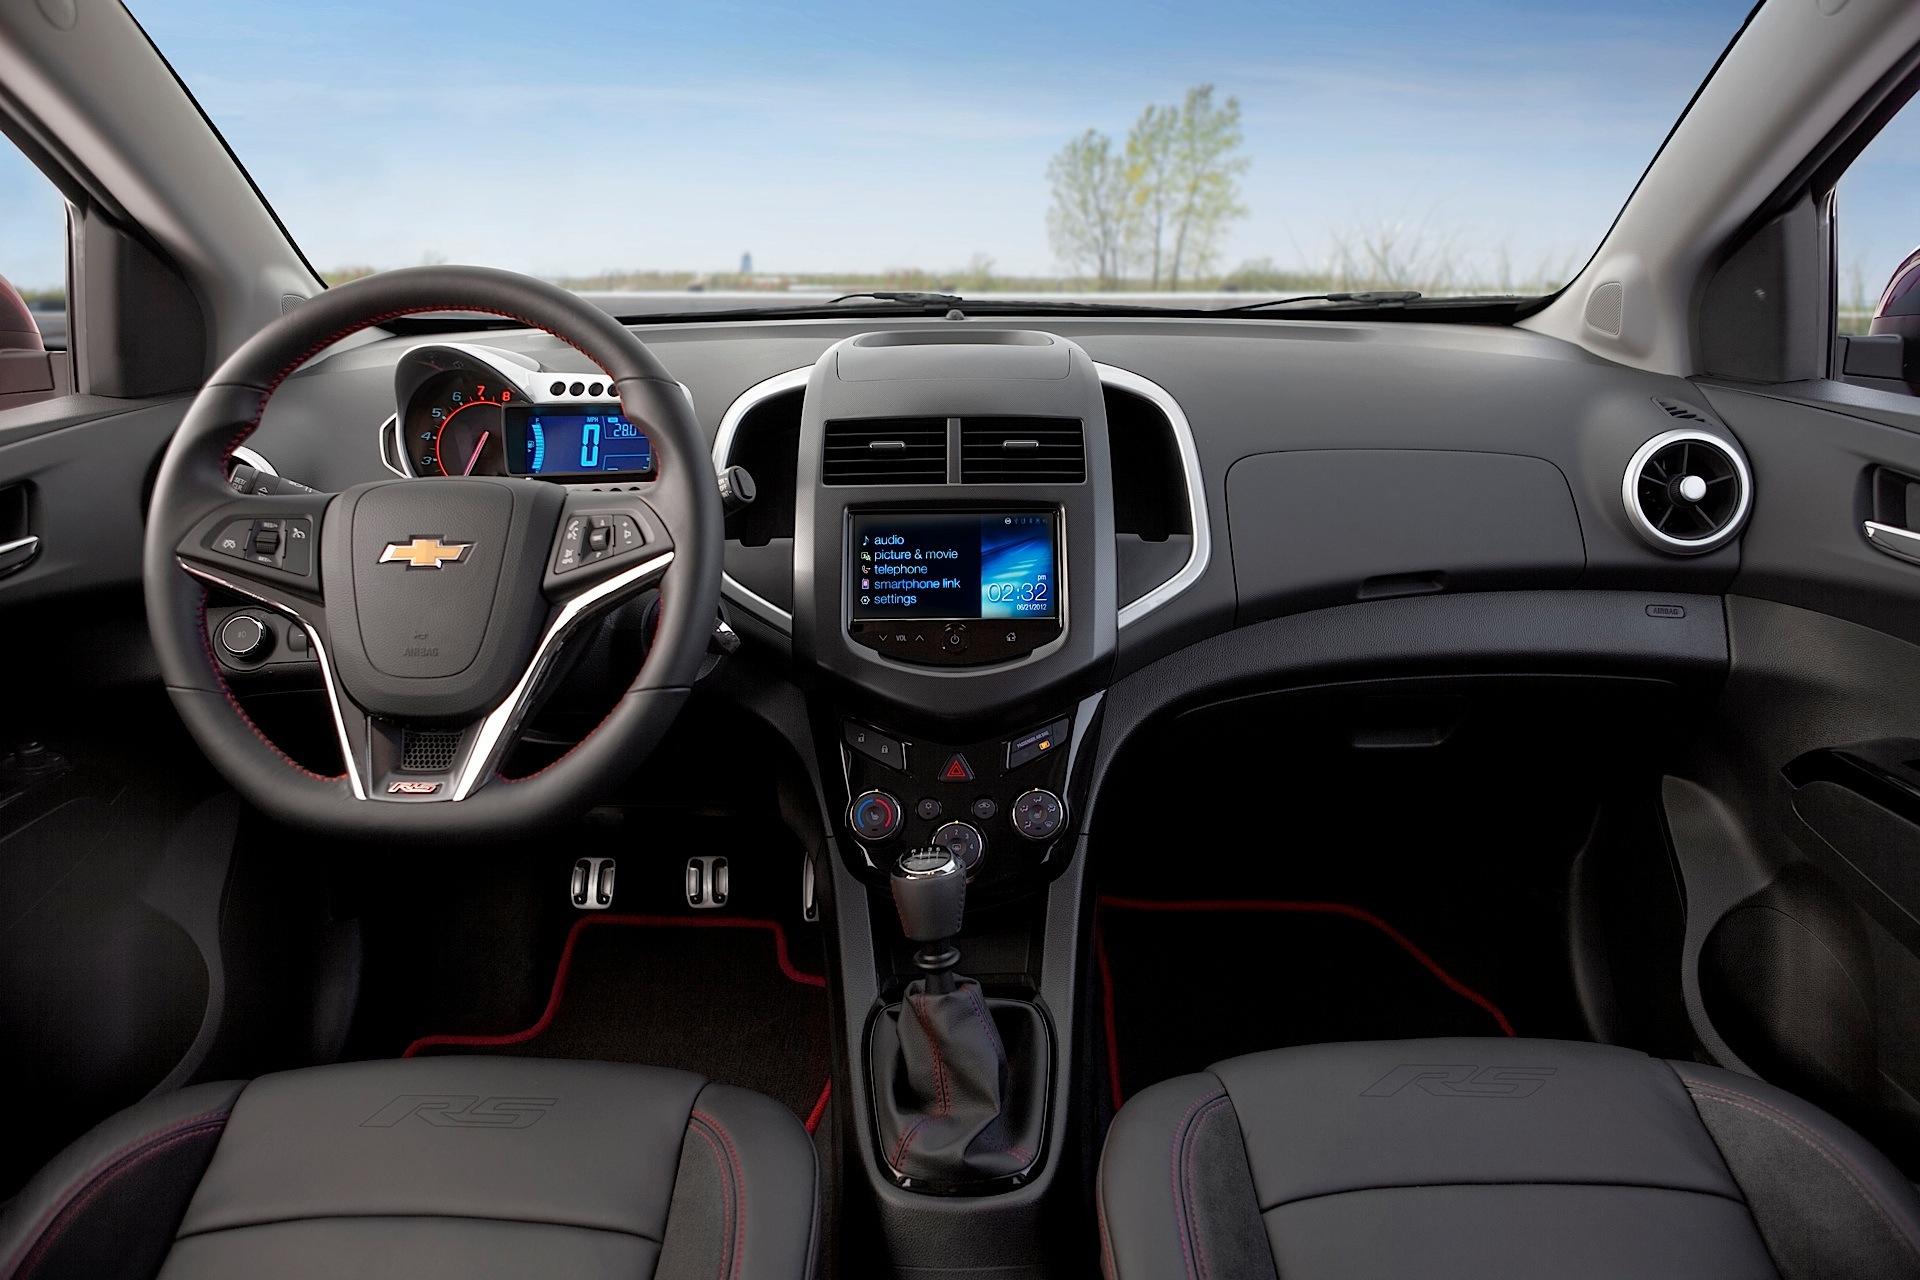 Honda Latest Models >> CHEVROLET Sonic RS - 2012, 2013, 2014, 2015, 2016 - autoevolution